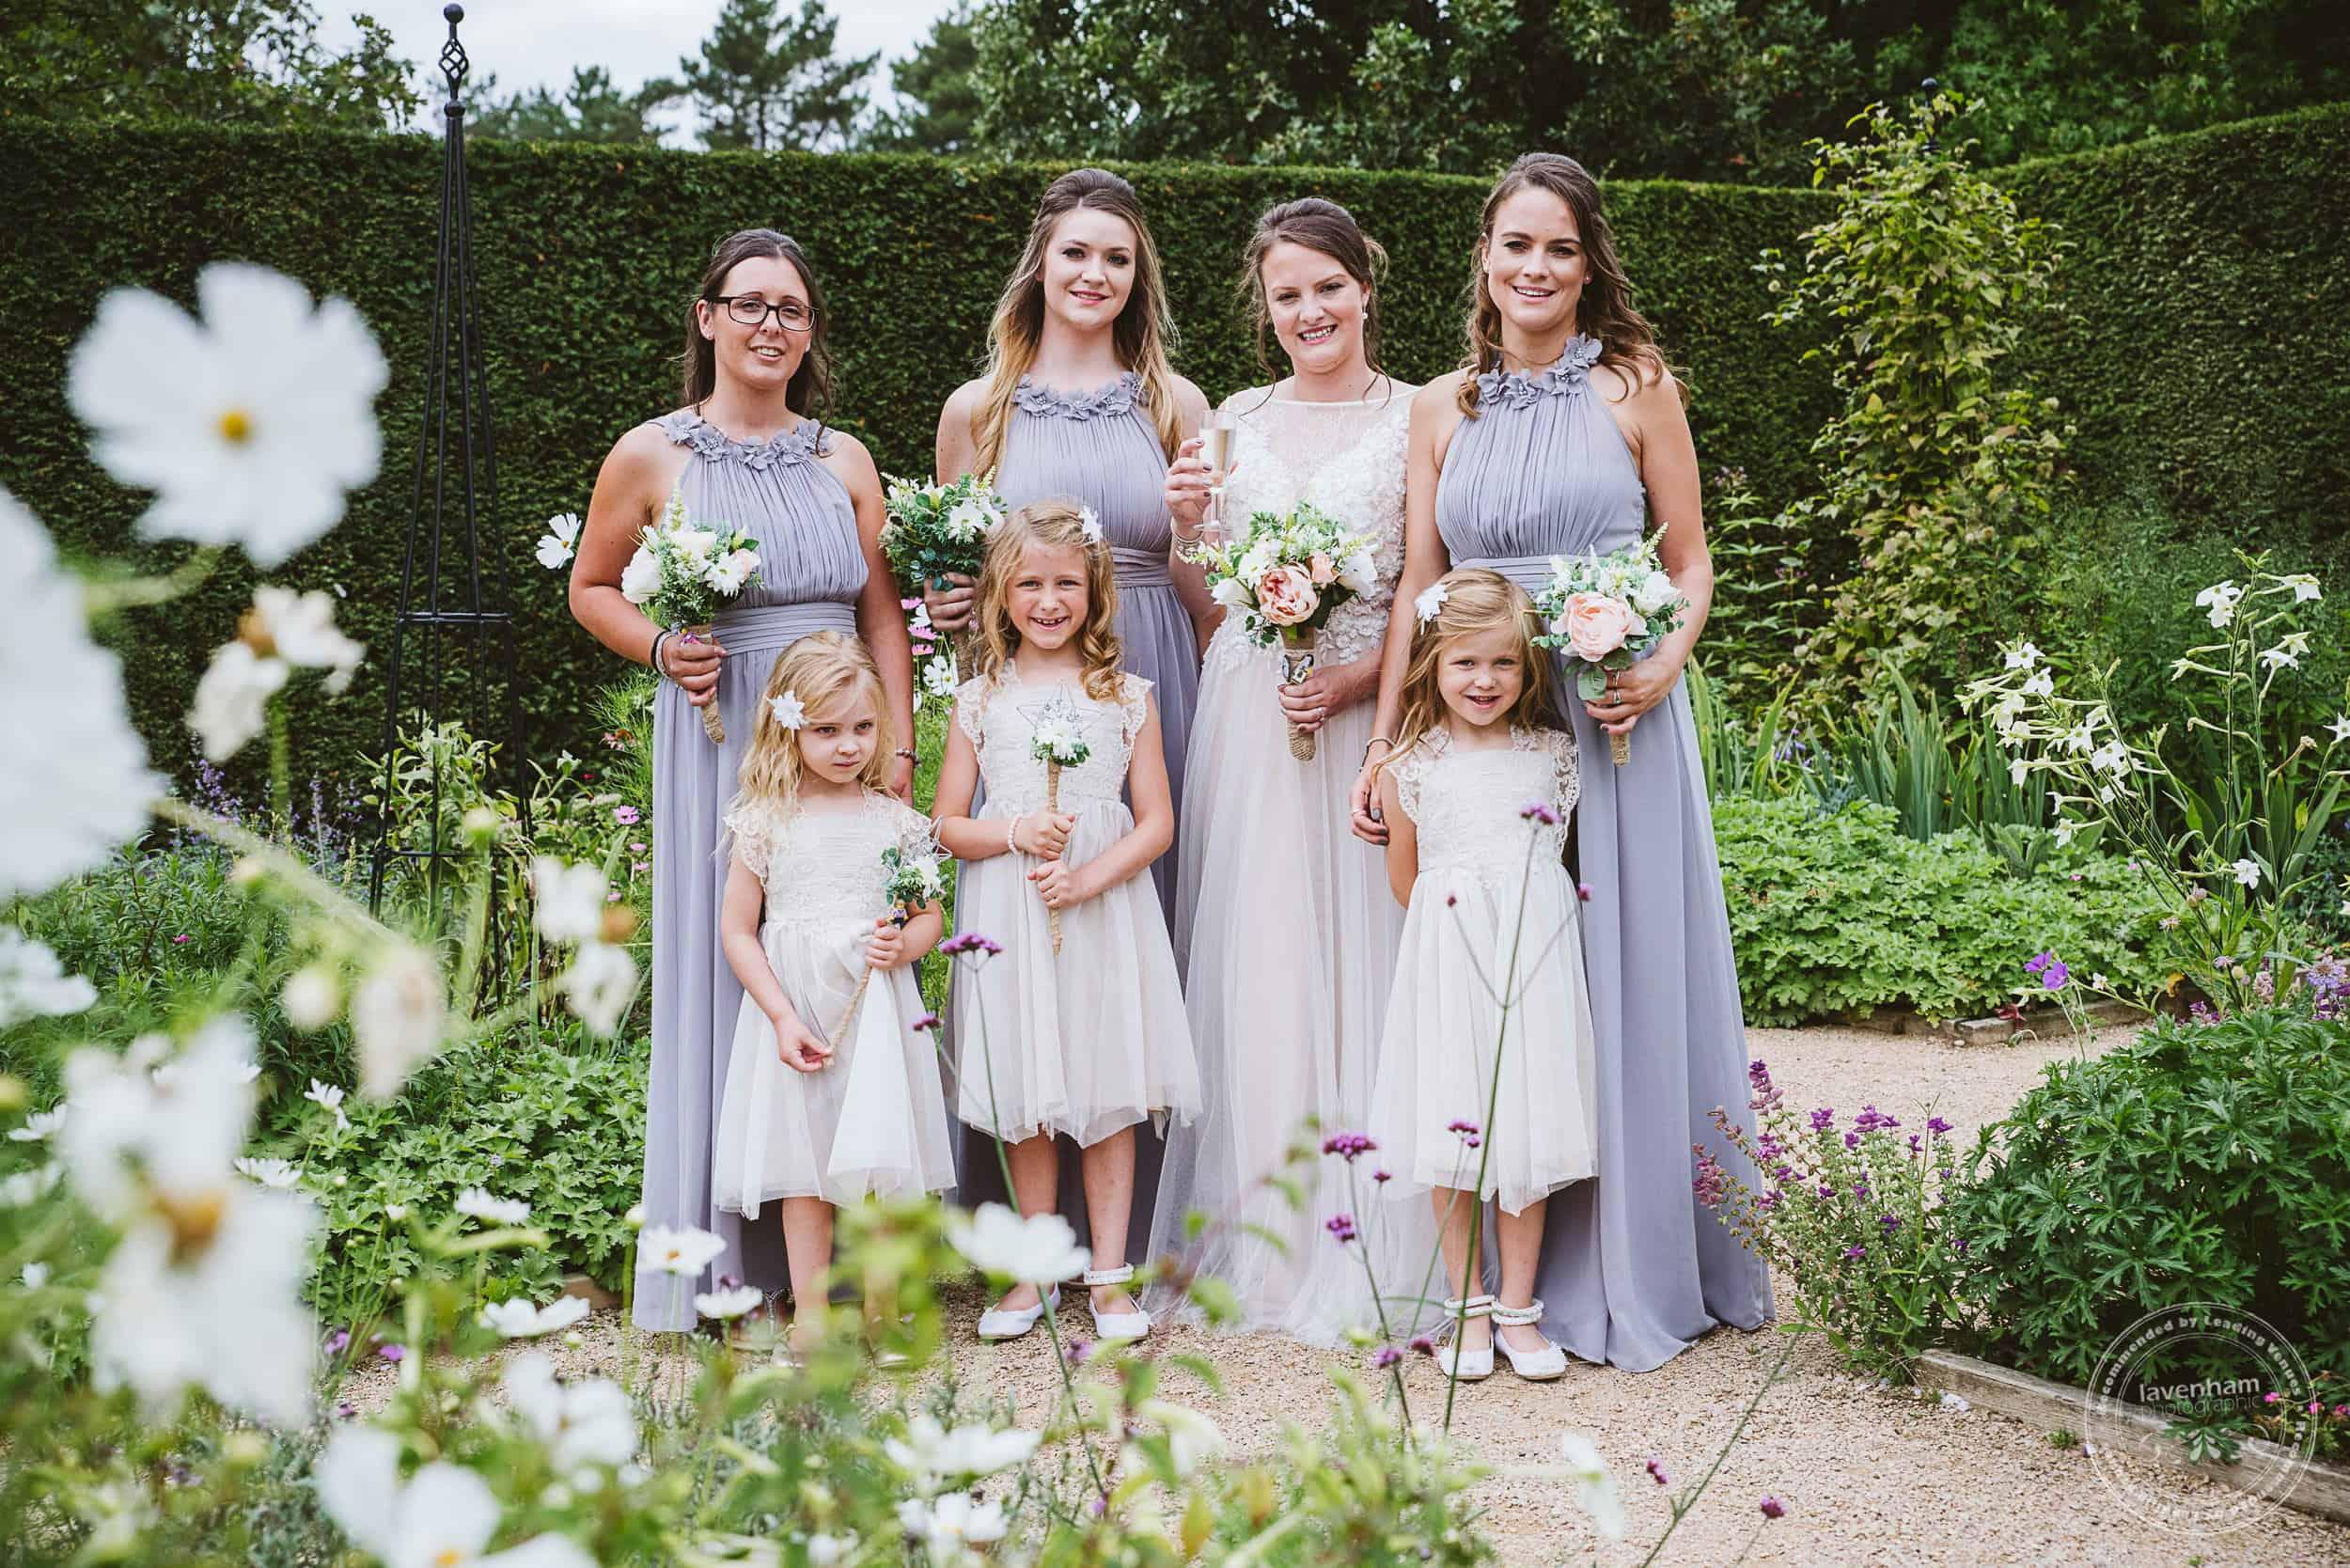 180818 Marks Hall Wedding Photography Lavenham Photographic 108